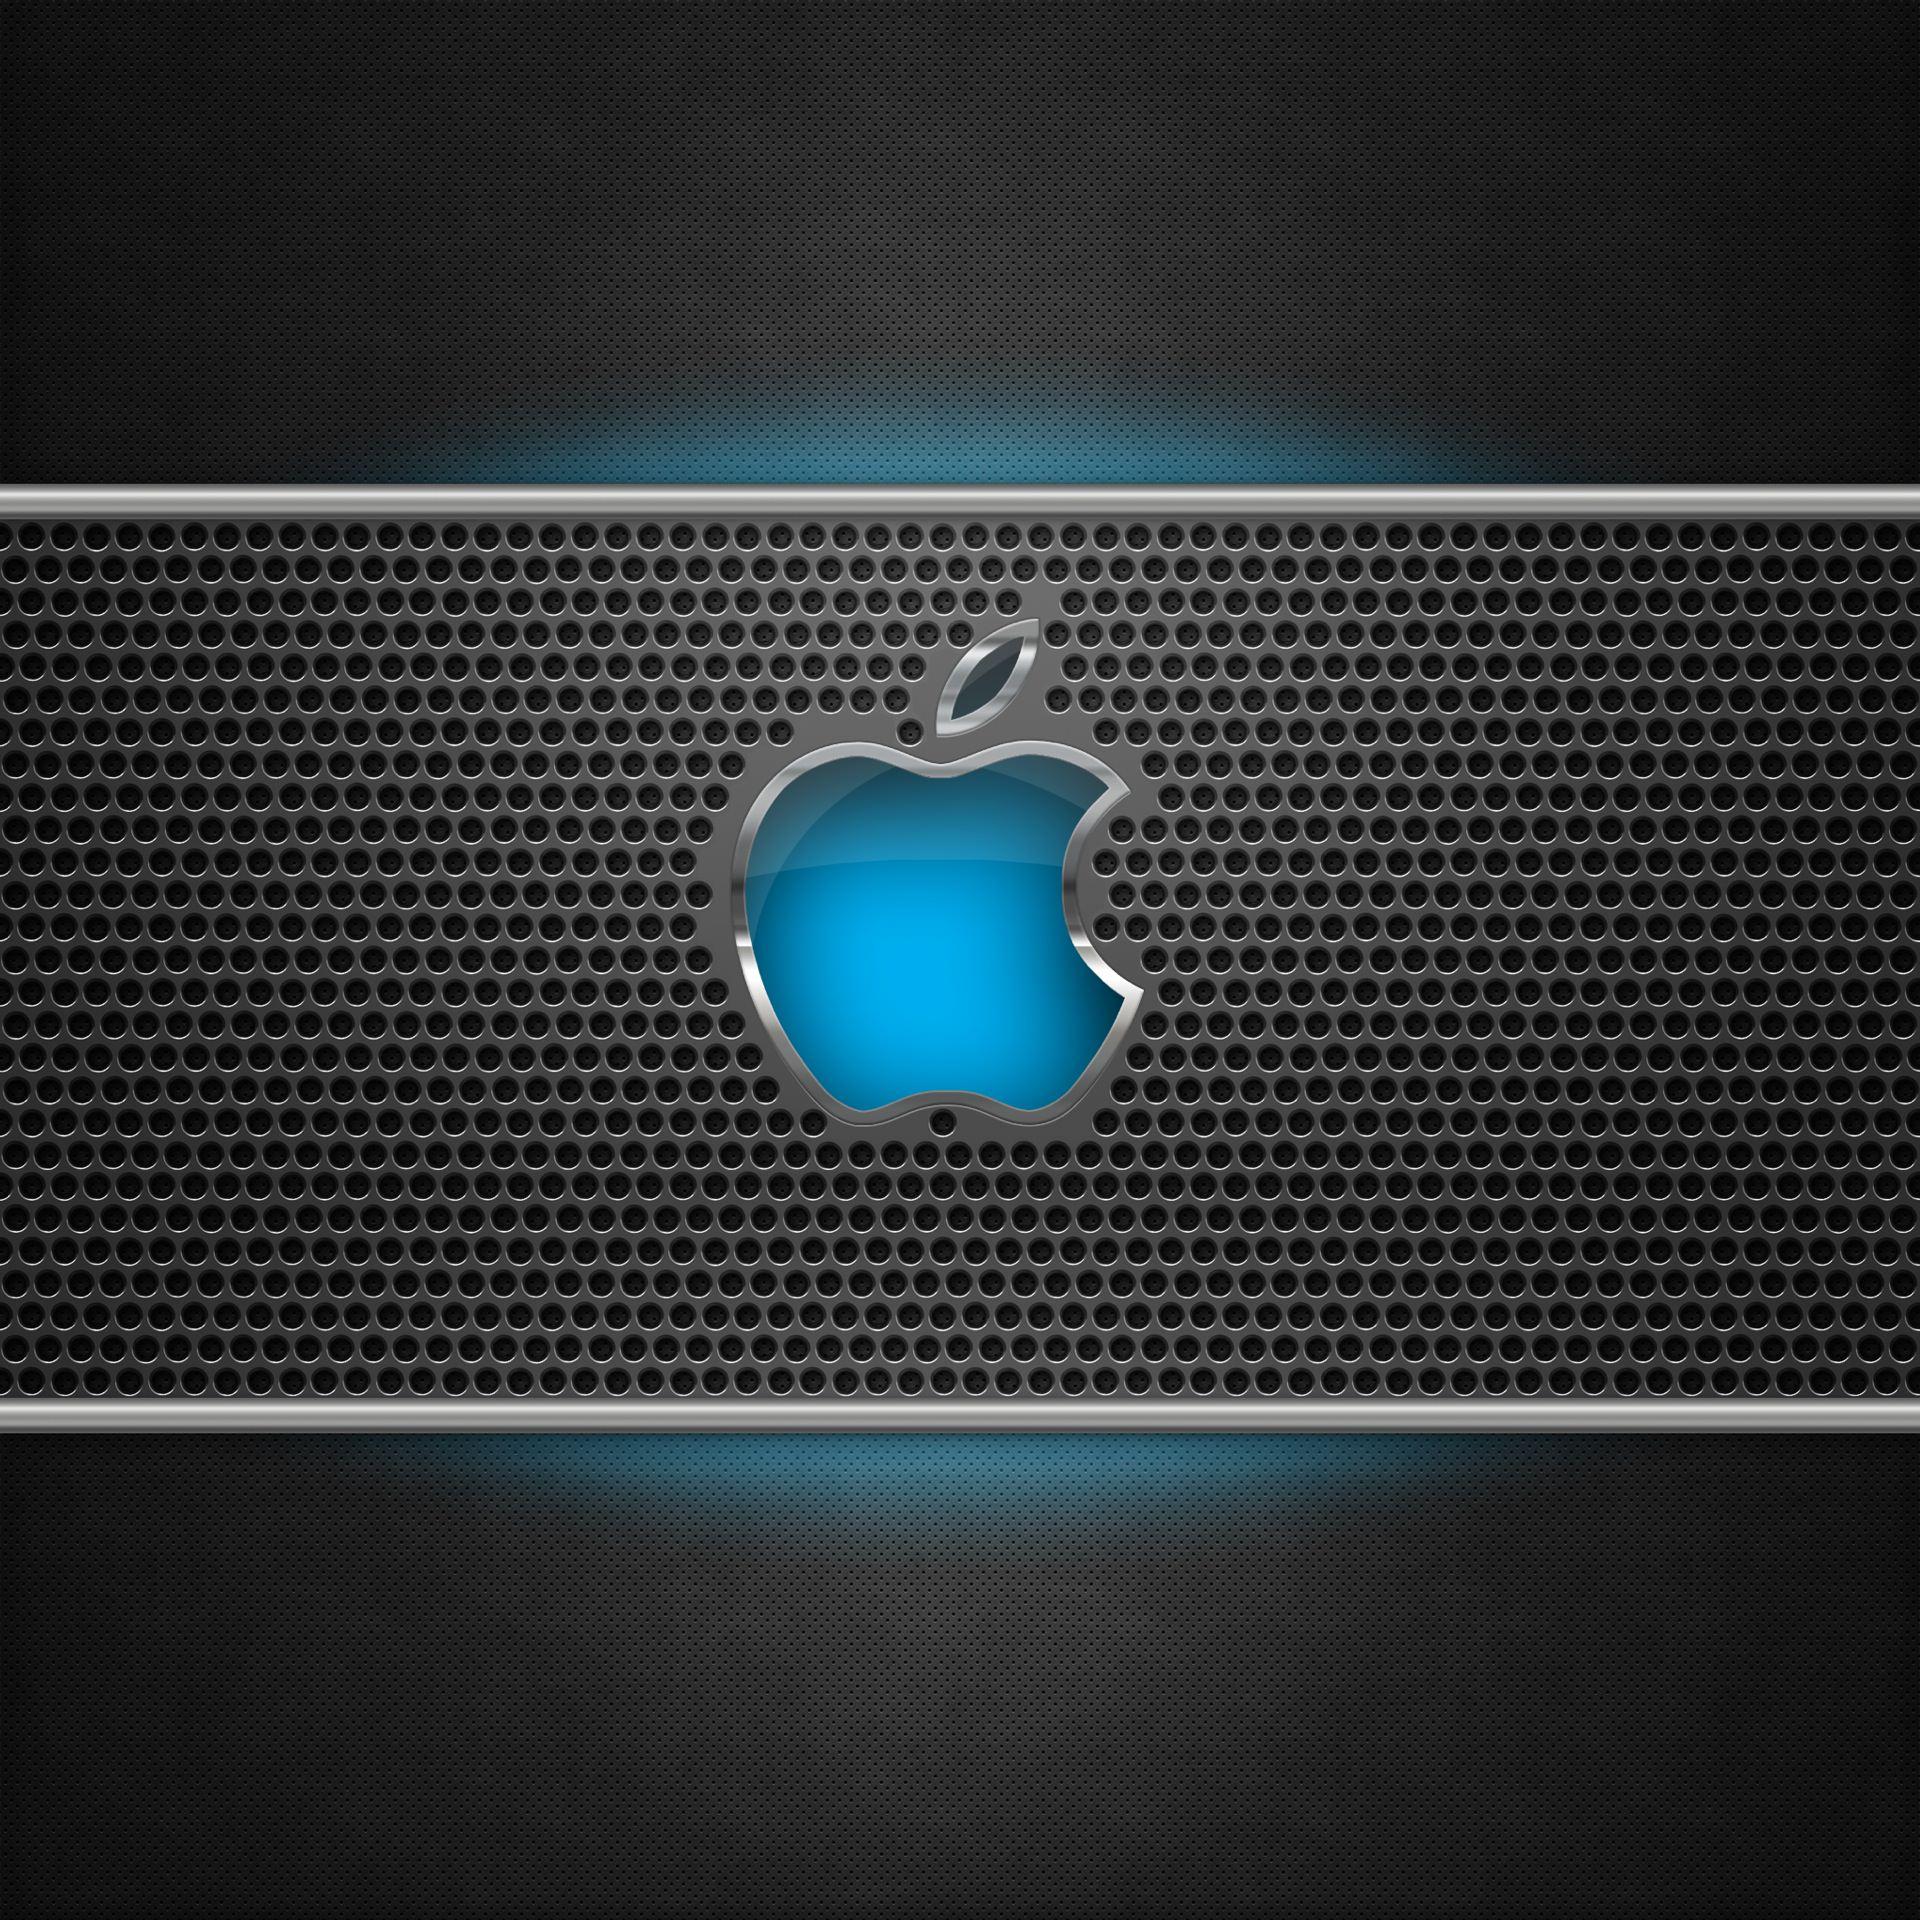 Apple青黒 Wallpaper Sc スマホ壁紙